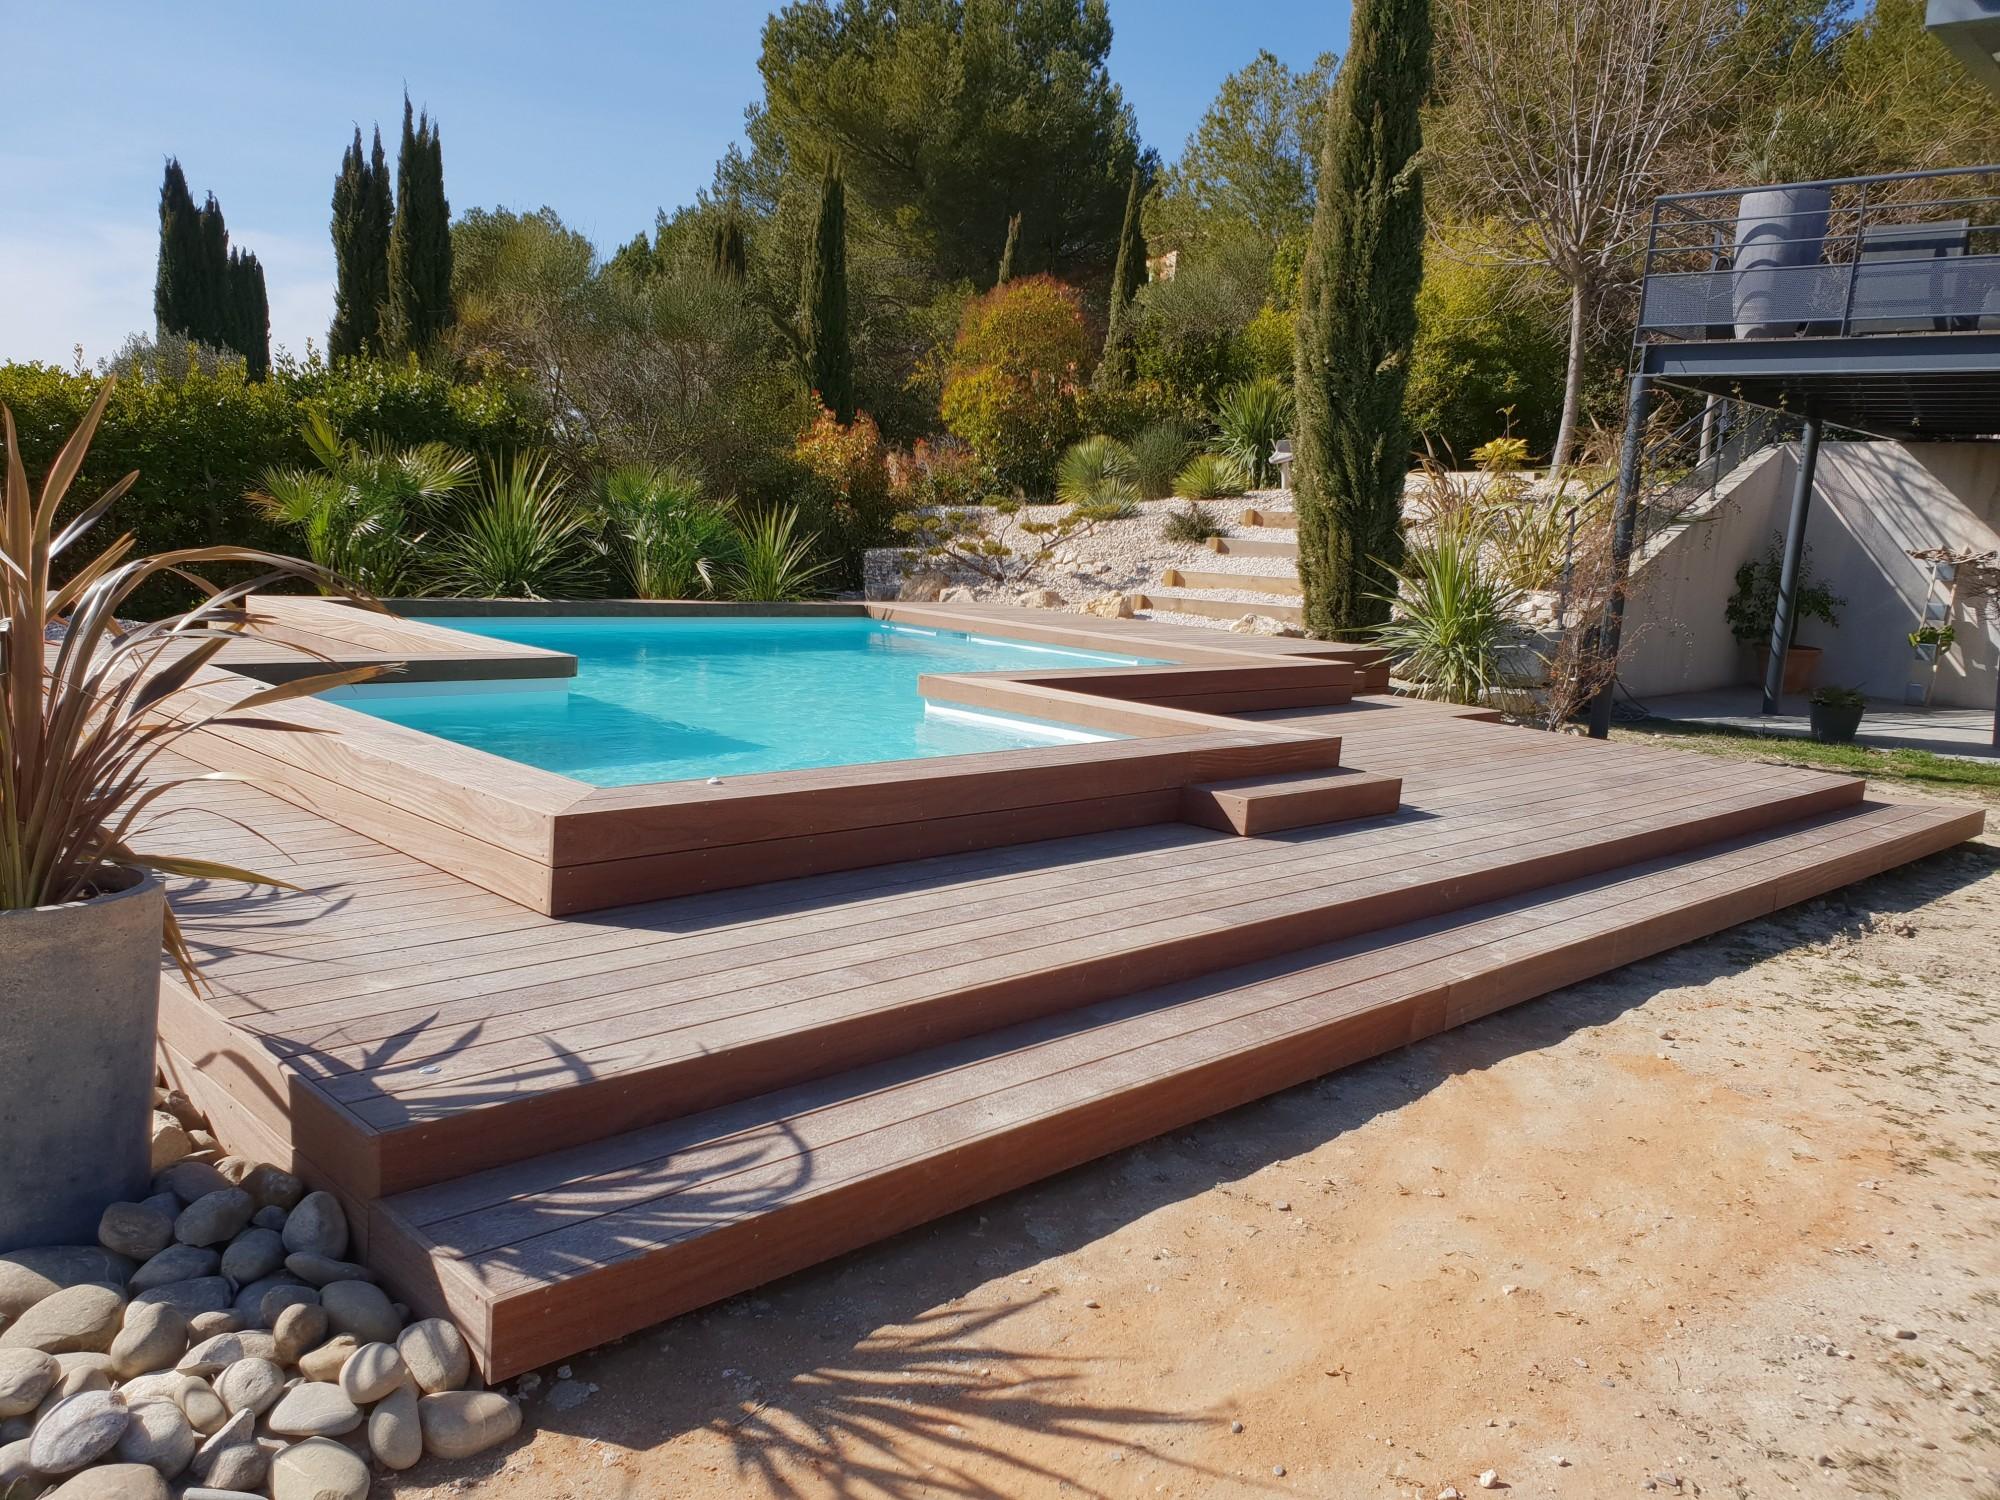 Tour de piscine en cumaru aix en provence les terrasses du bois - Tour de piscine en bois ...